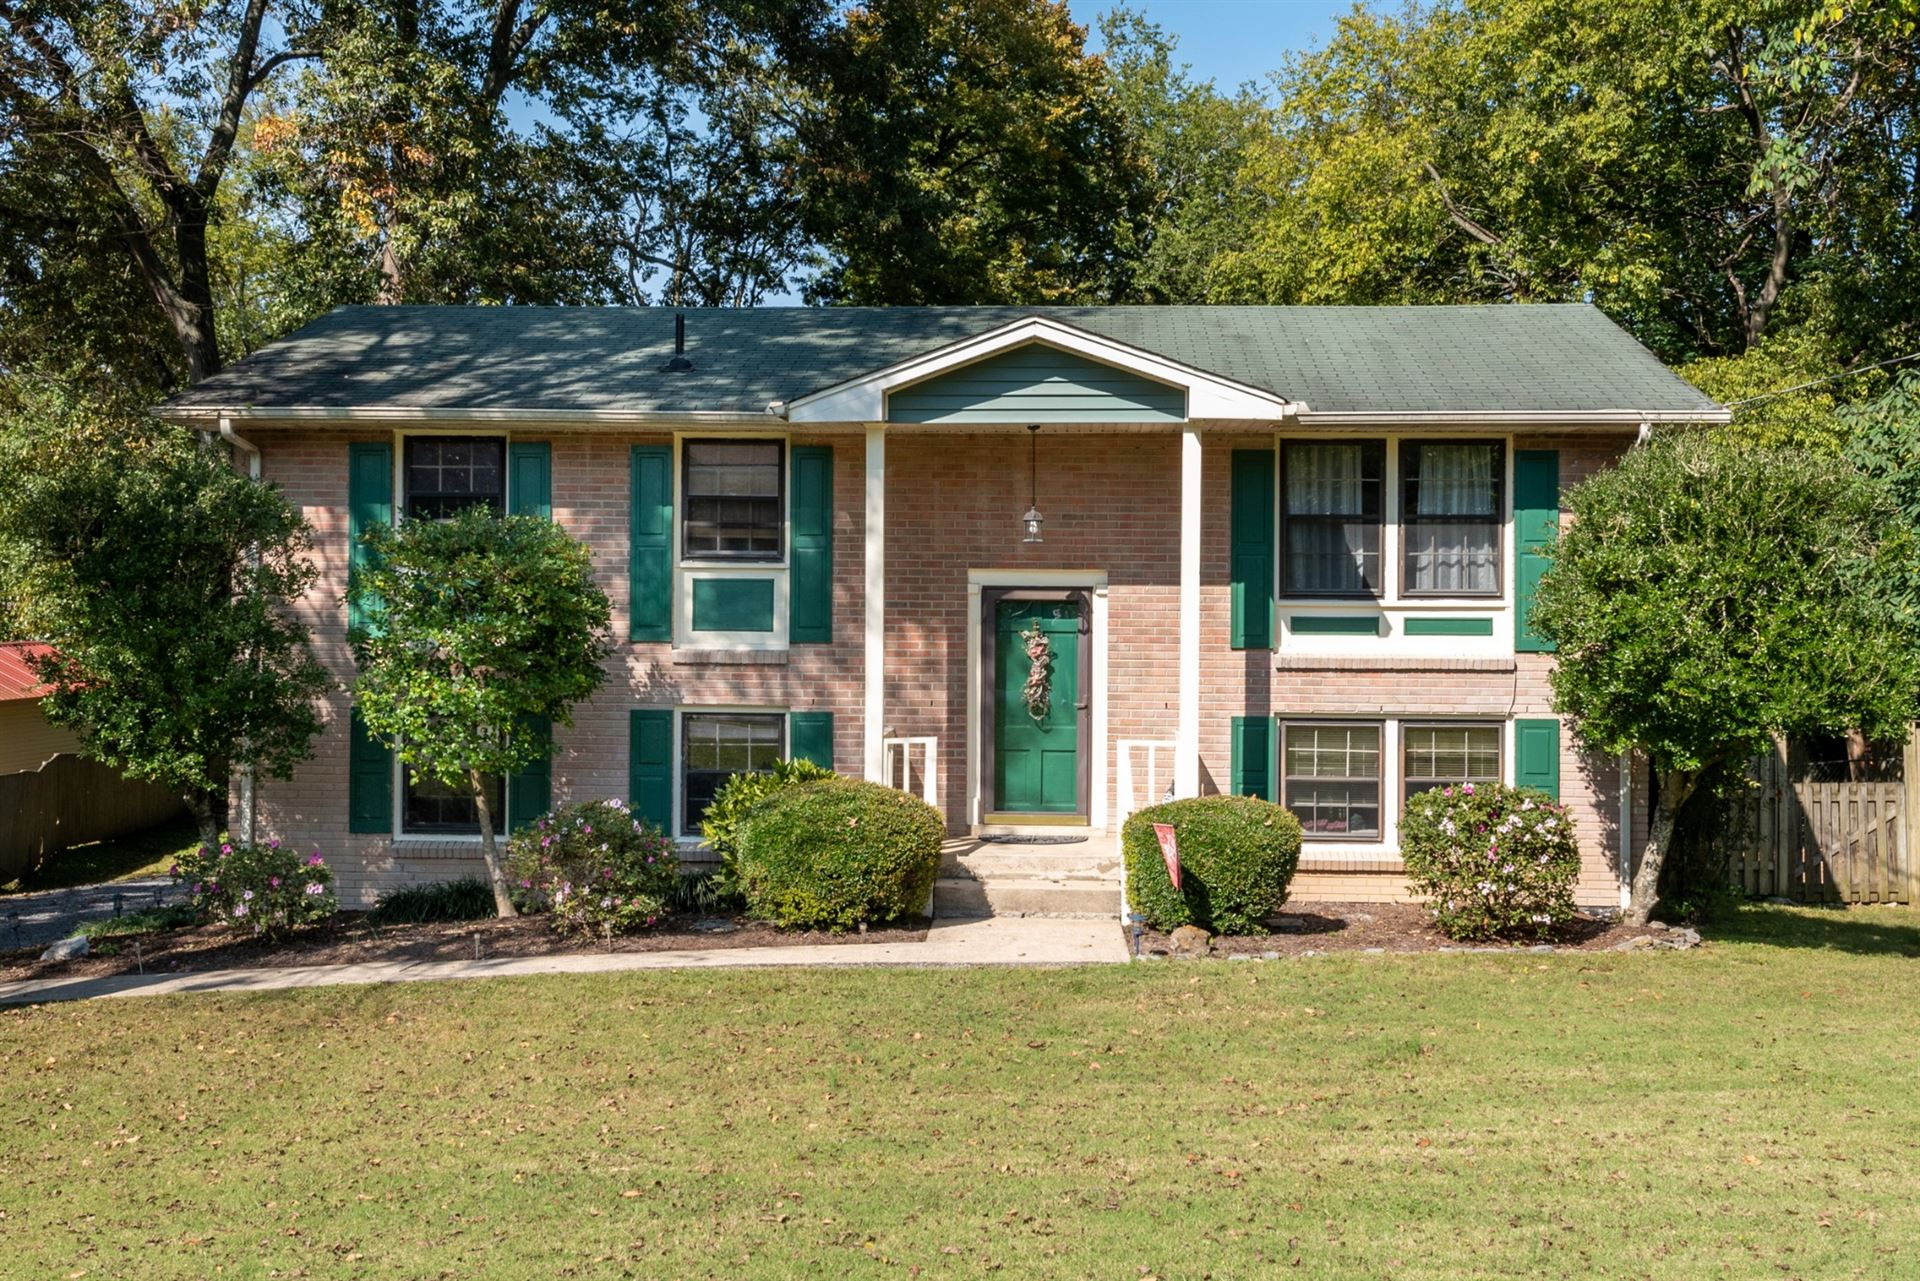 103 Shadydale Dr, Hendersonville, TN 37075 - MLS#: 2196497